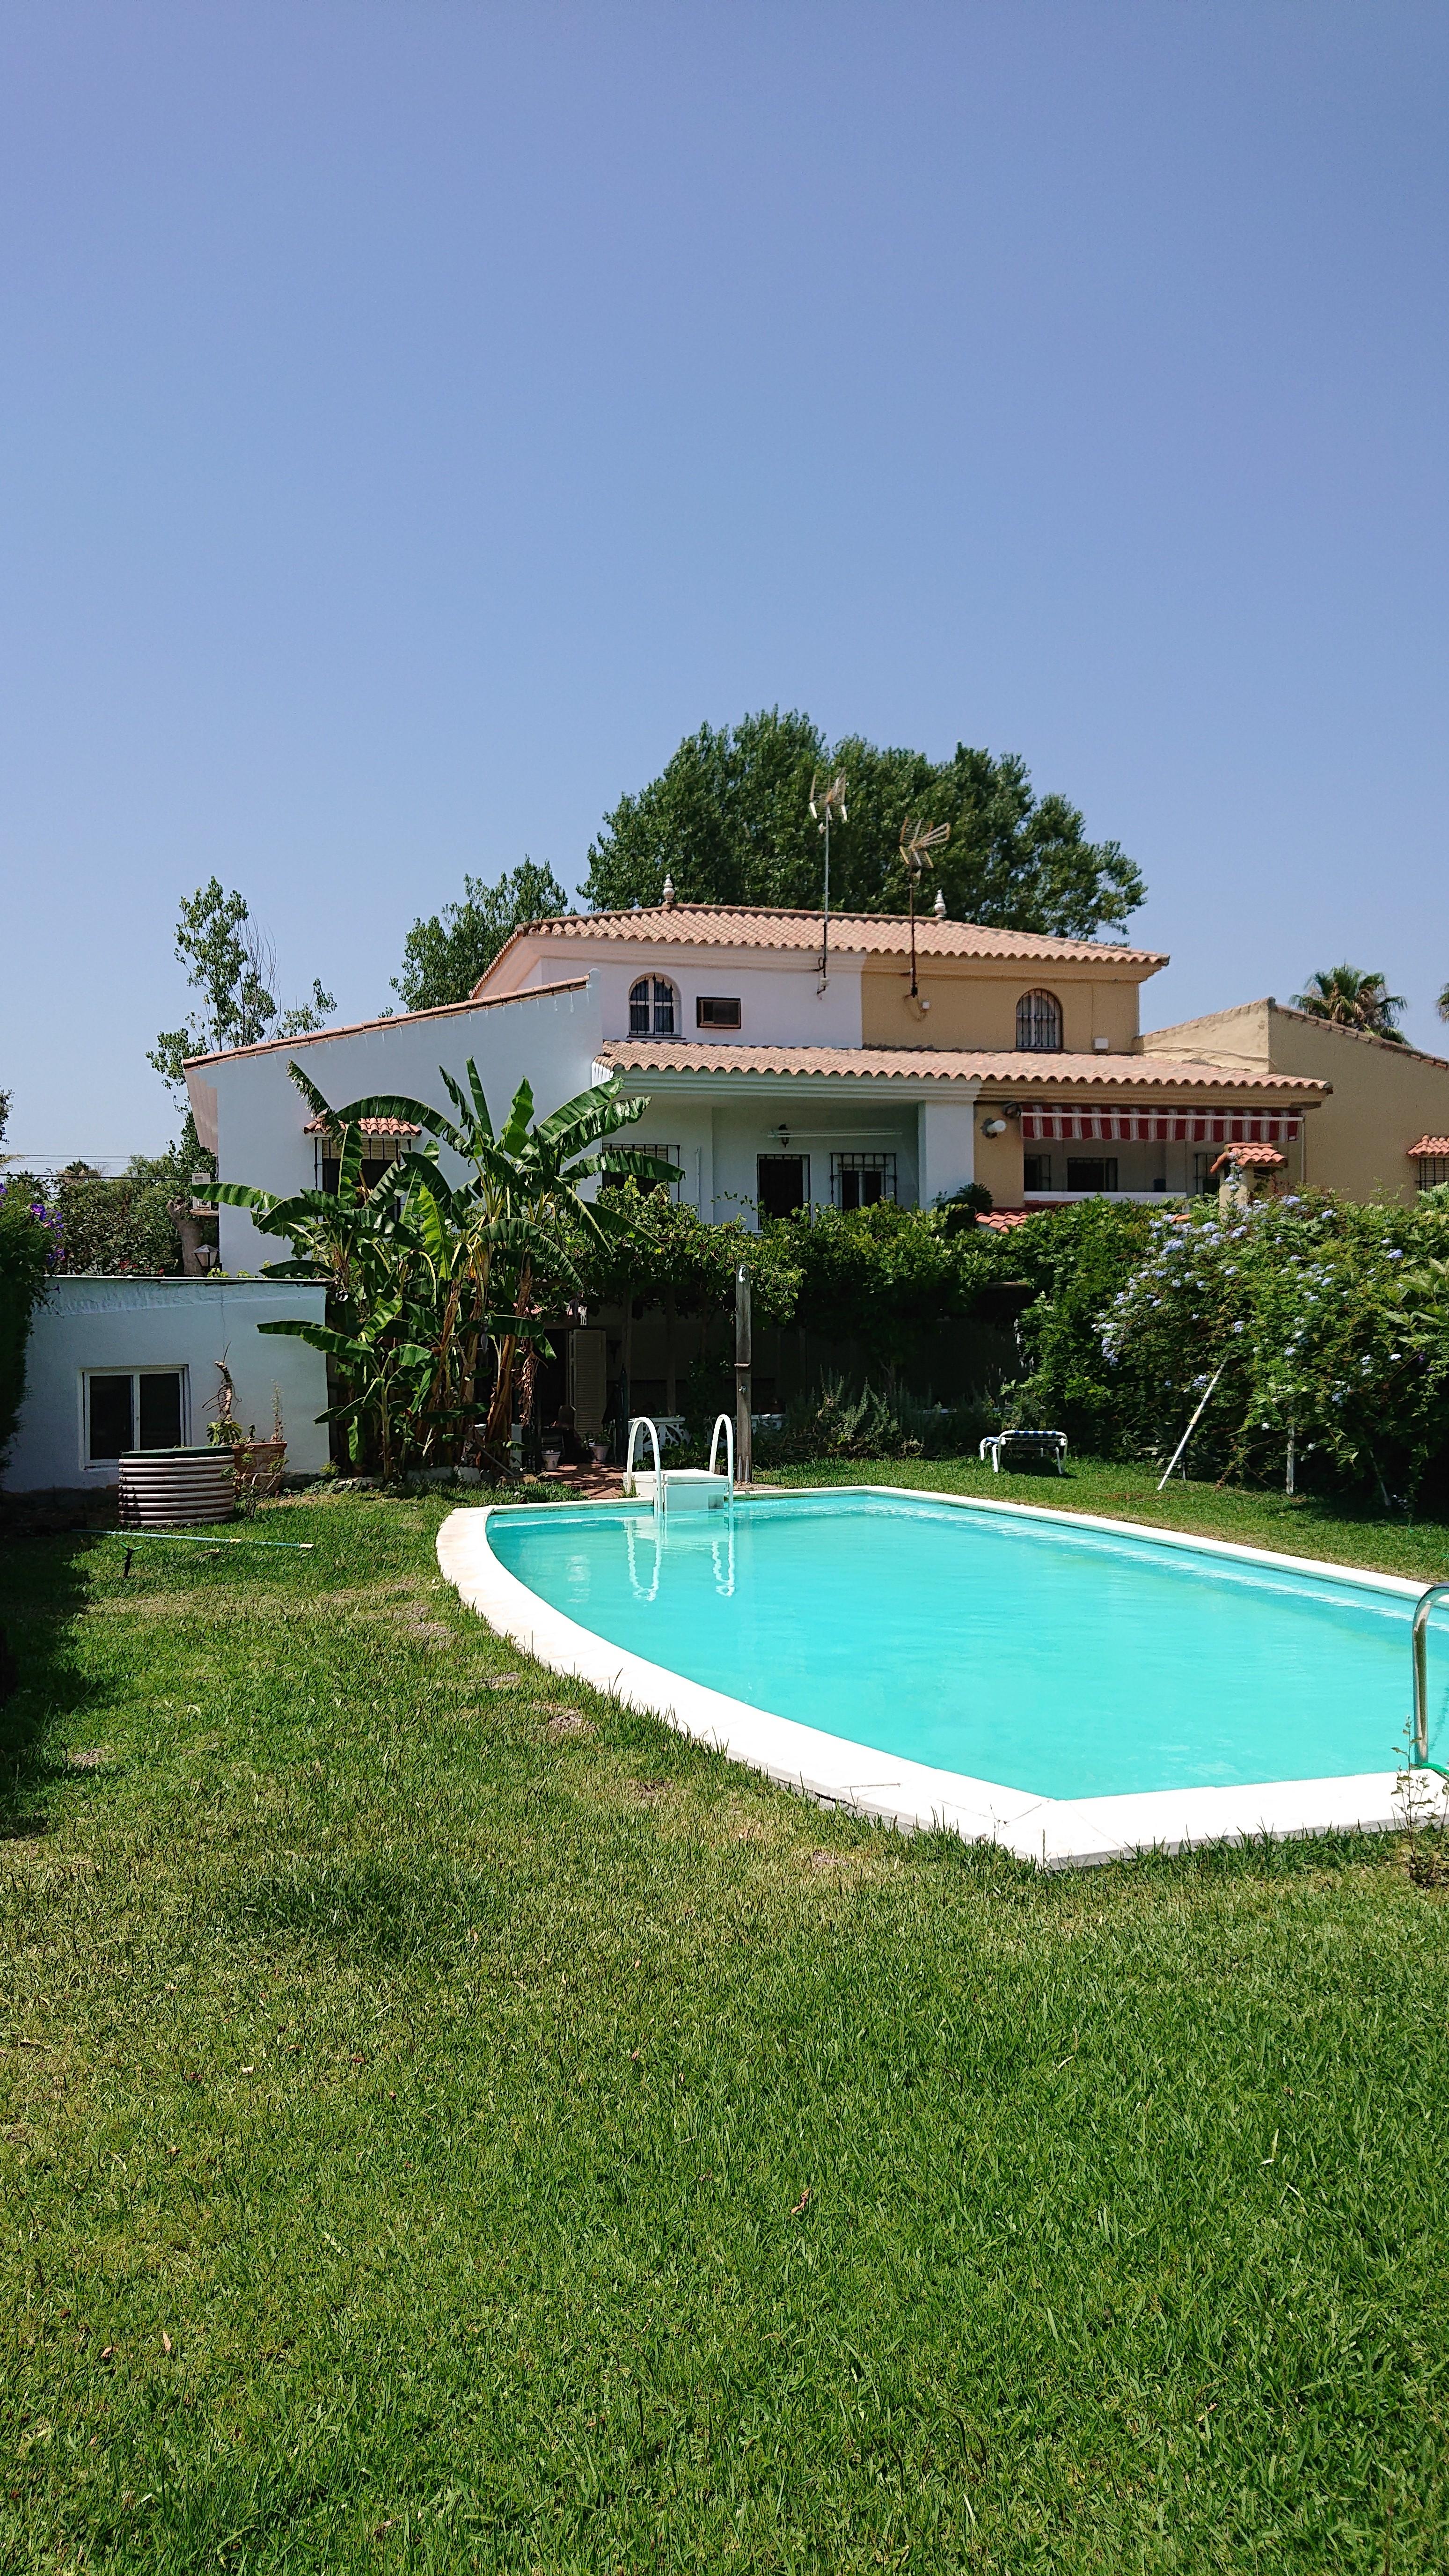 House villa 380 sq m